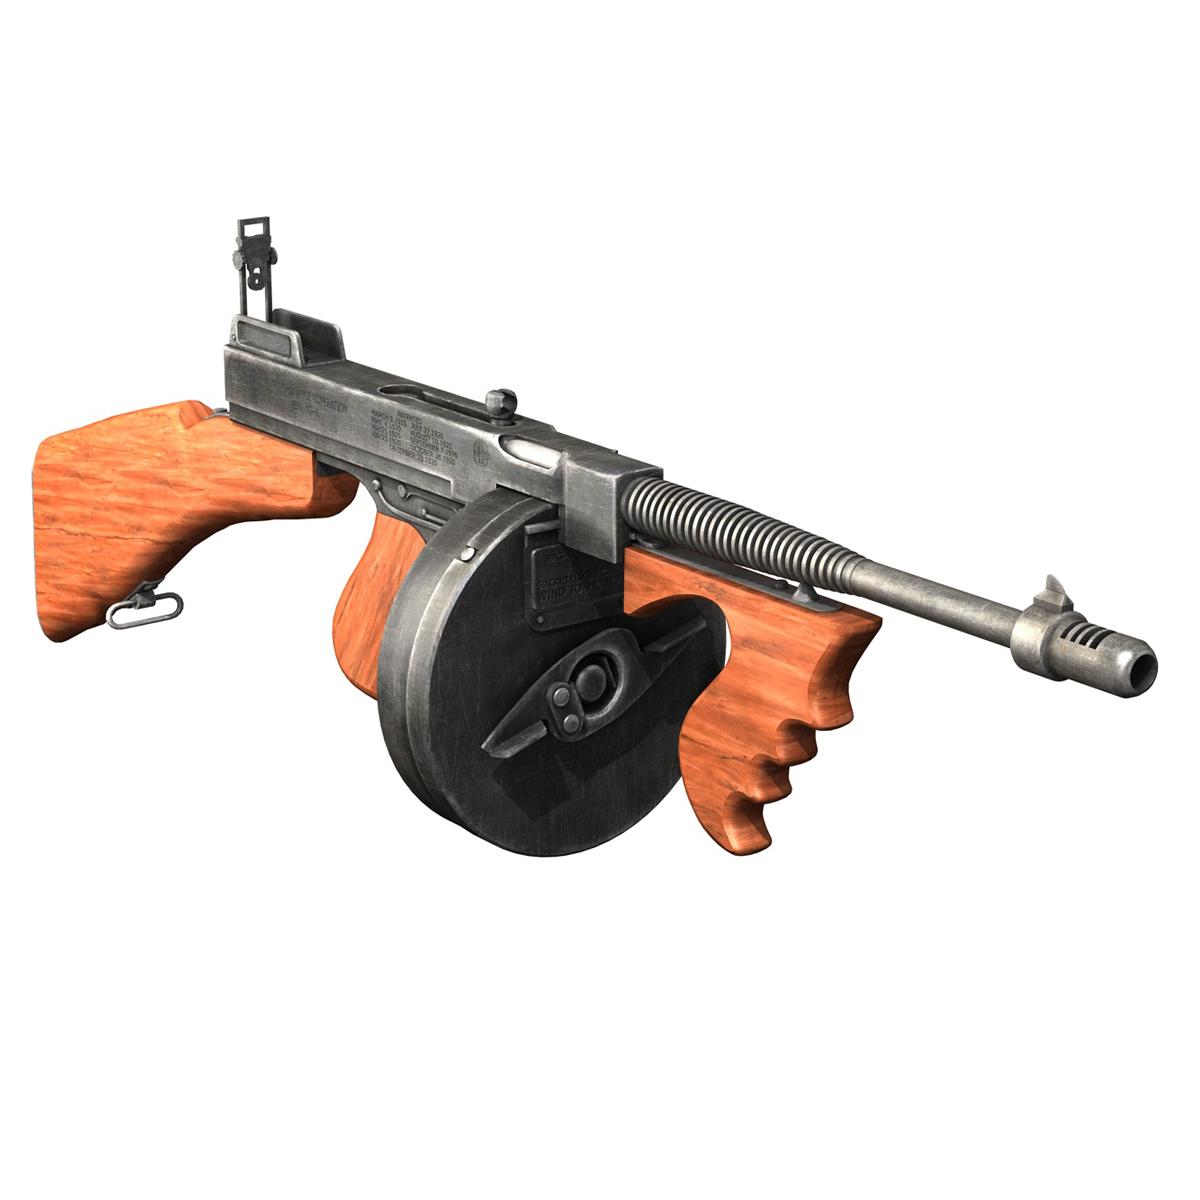 colt model1921 thompson submachine gun 3d model 3ds c4d lwo obj 264704